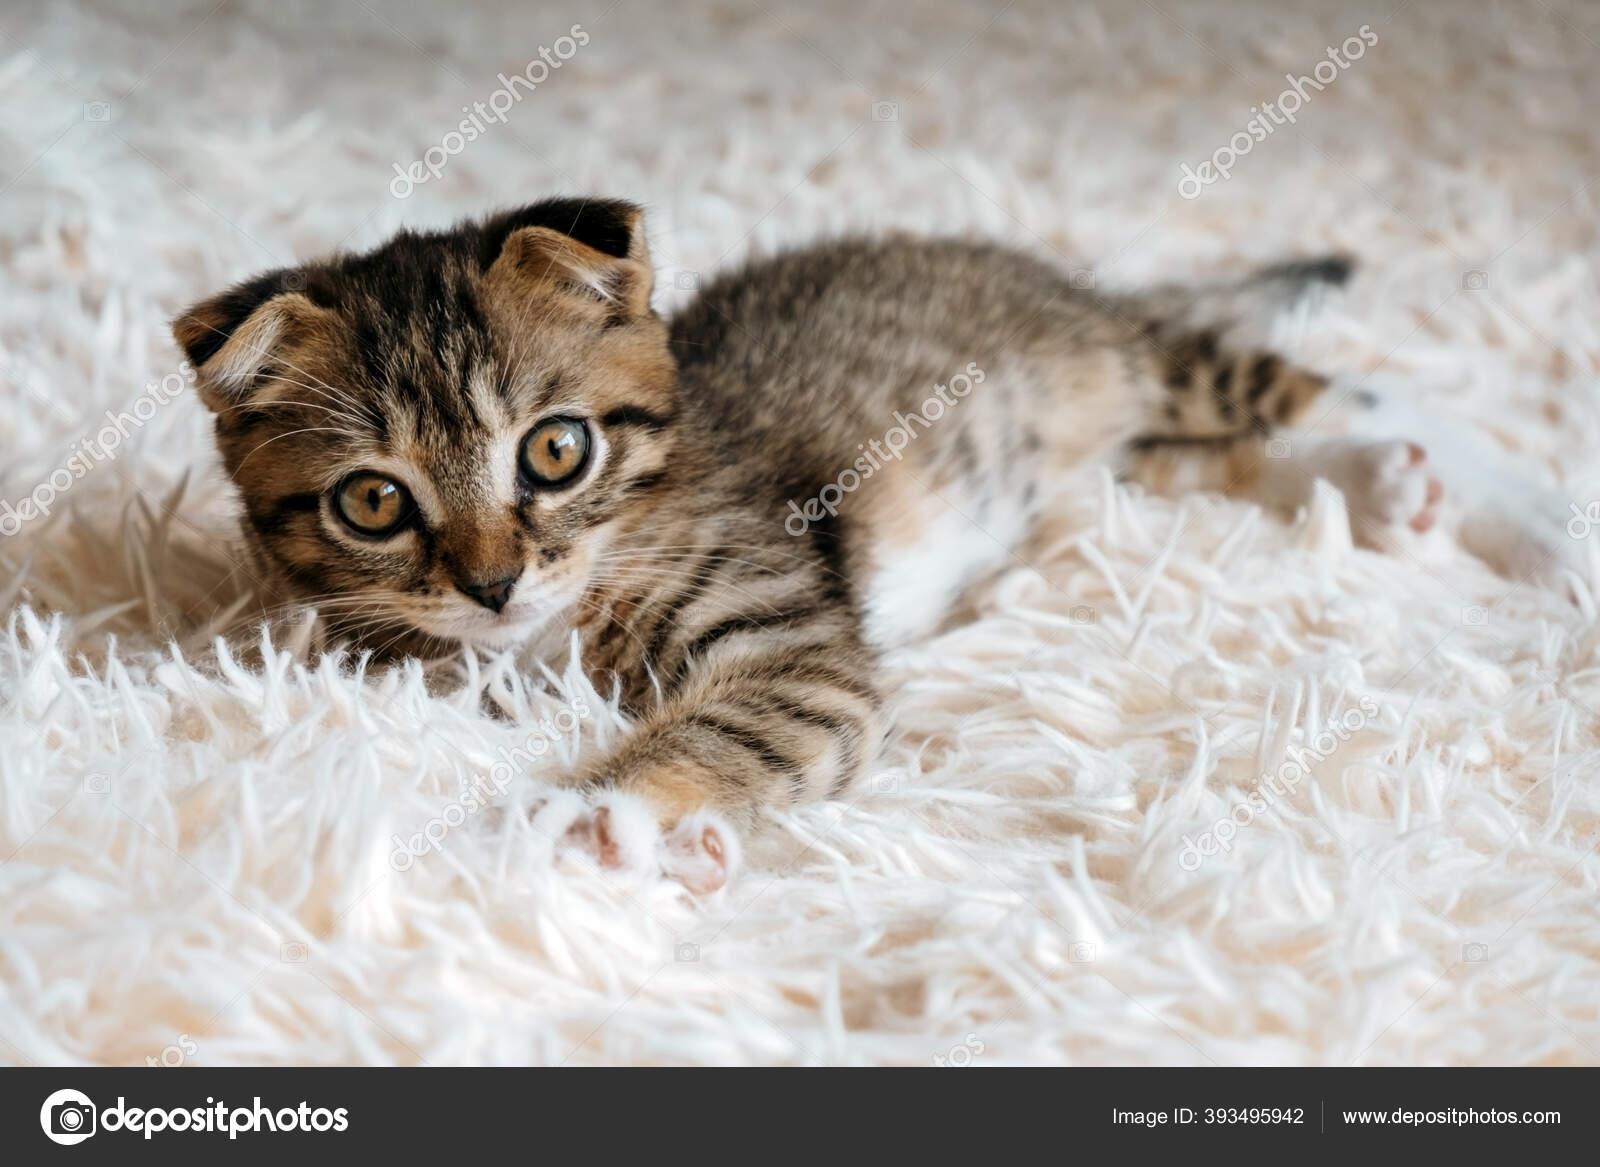 Potret Dari Scottilop Lucu Telinga Kucing Tergeletak Atas Selimut Berbulu Stok Foto C Dvulikaia 393495942